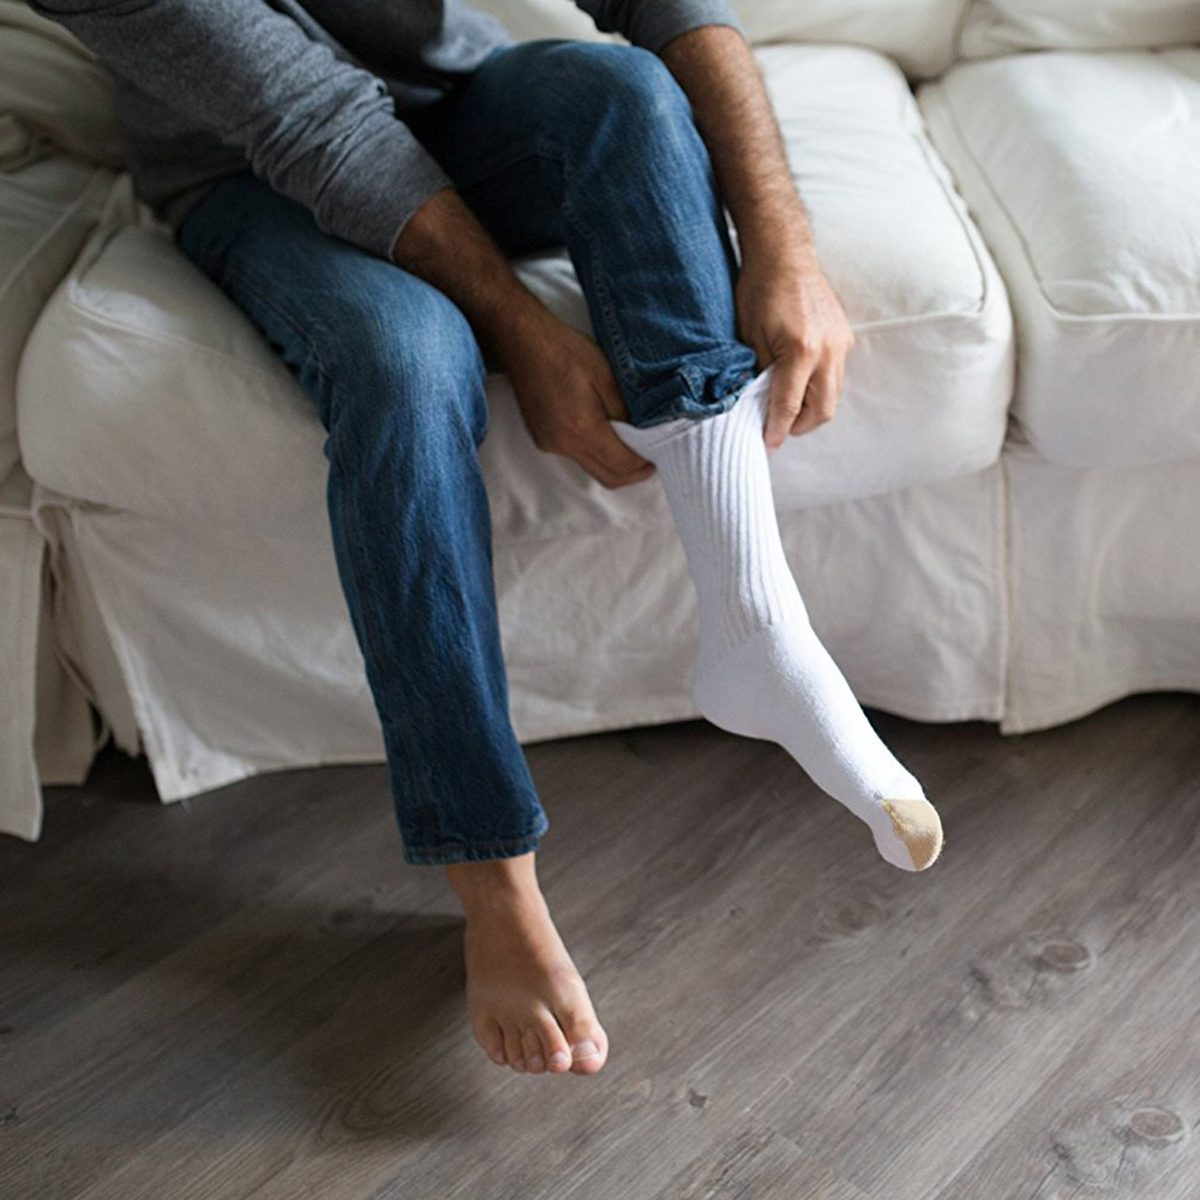 Gold Toe Men/'s Cotton Crew 656s Athletic Sock 12 Pairs 24 Socks